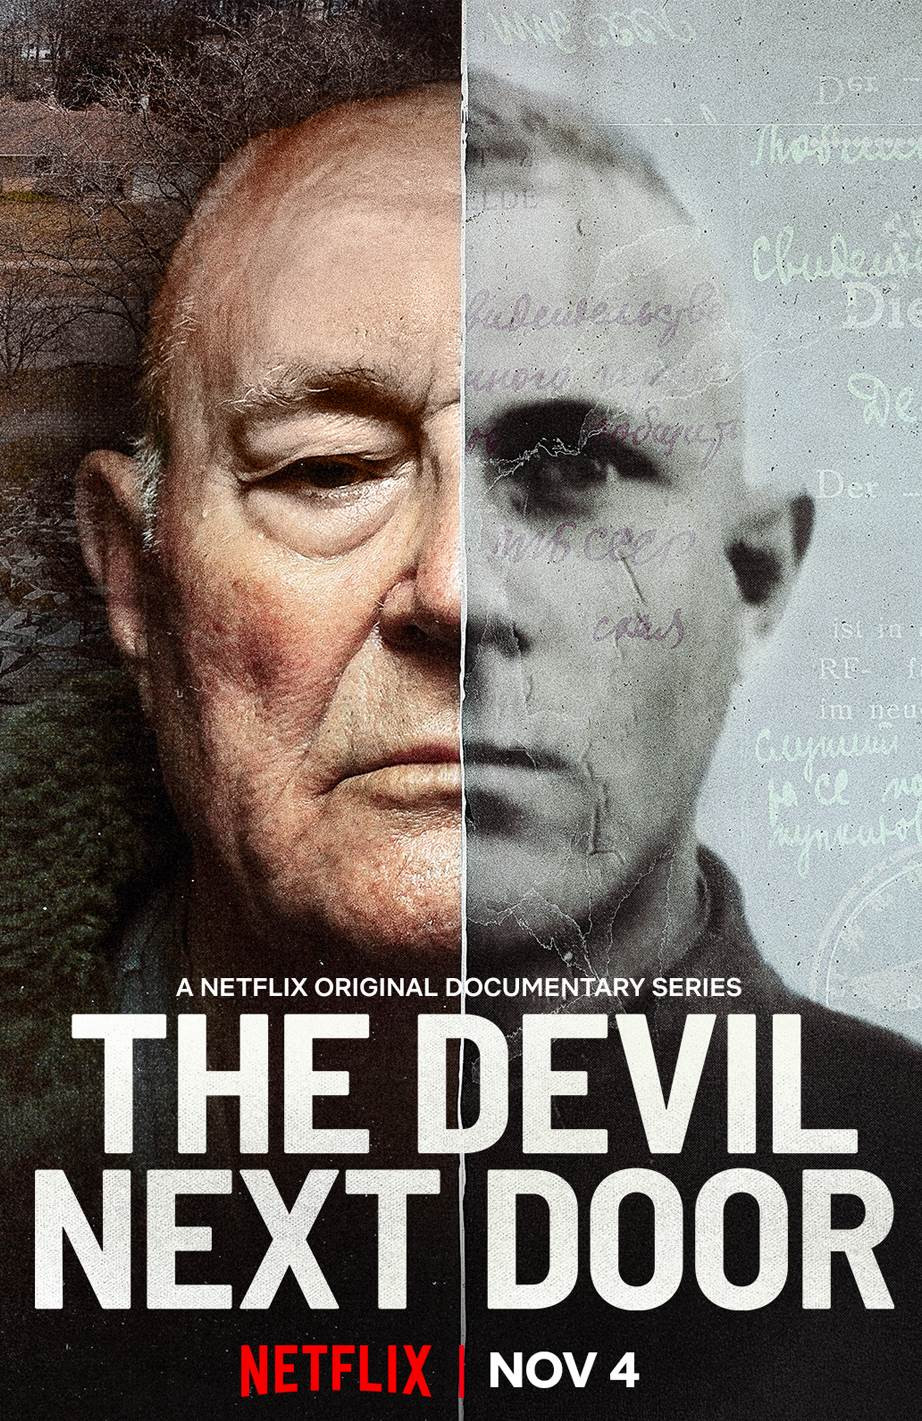 Best True Crime Series On Netflix Australia Right Now - The Devil Next Door